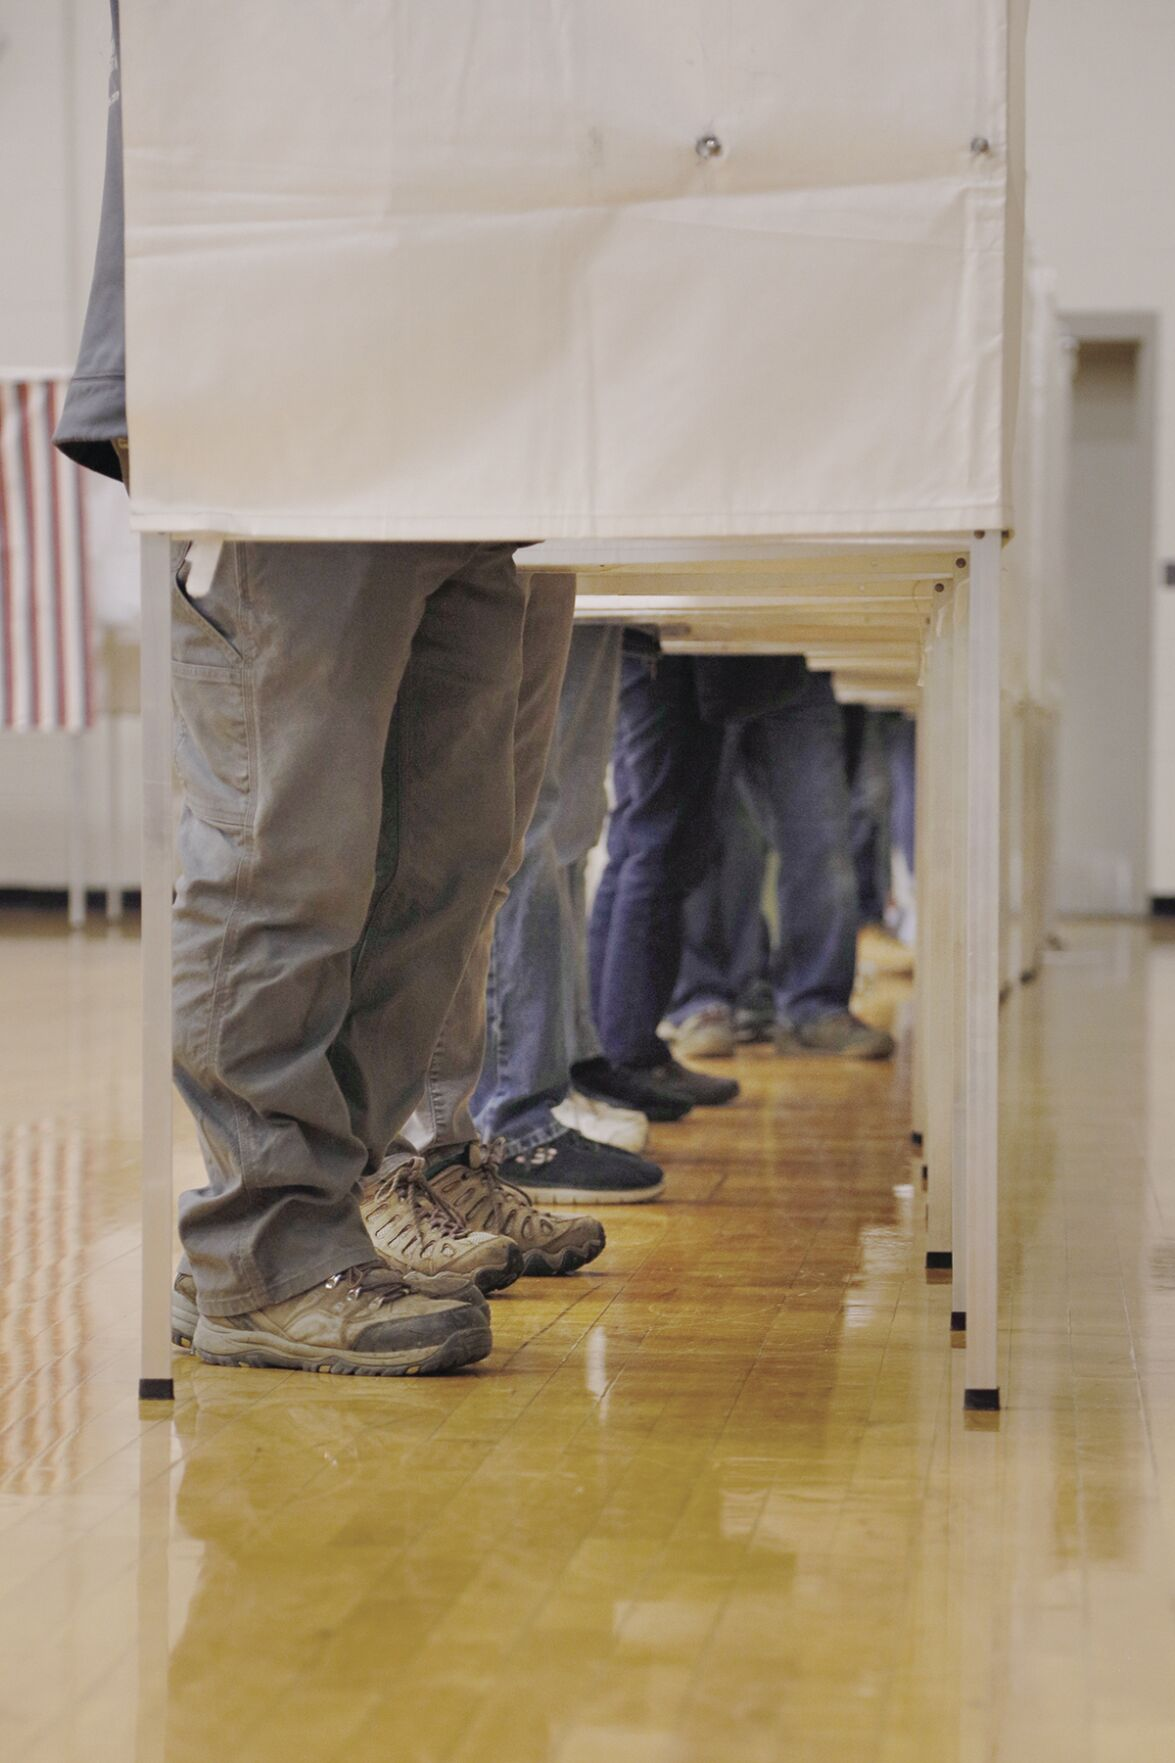 04-13-21 Voting feet